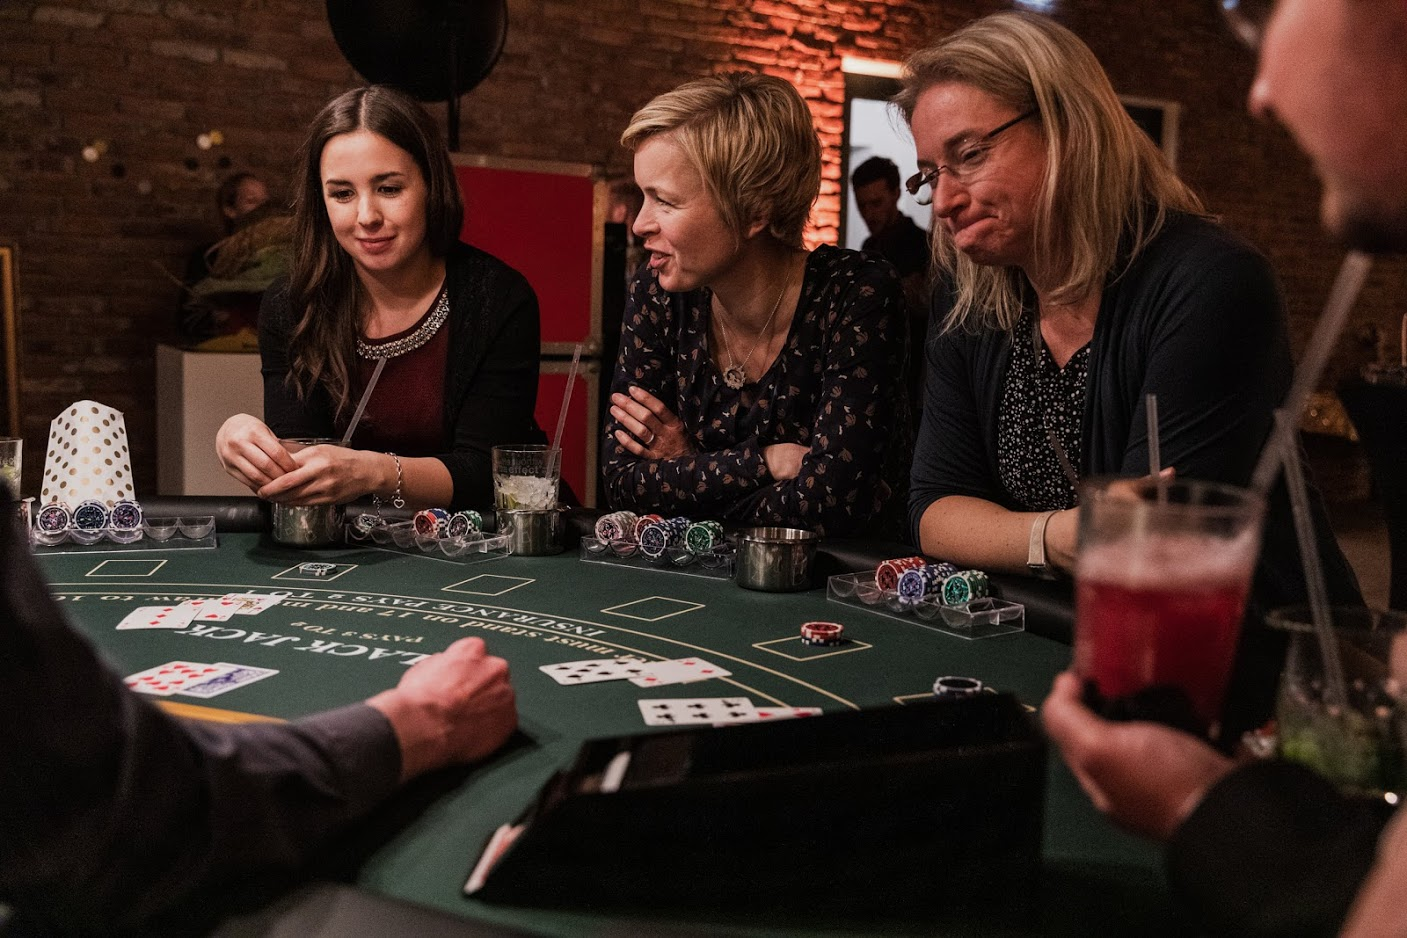 Casinonacht mit GAVESI Catering